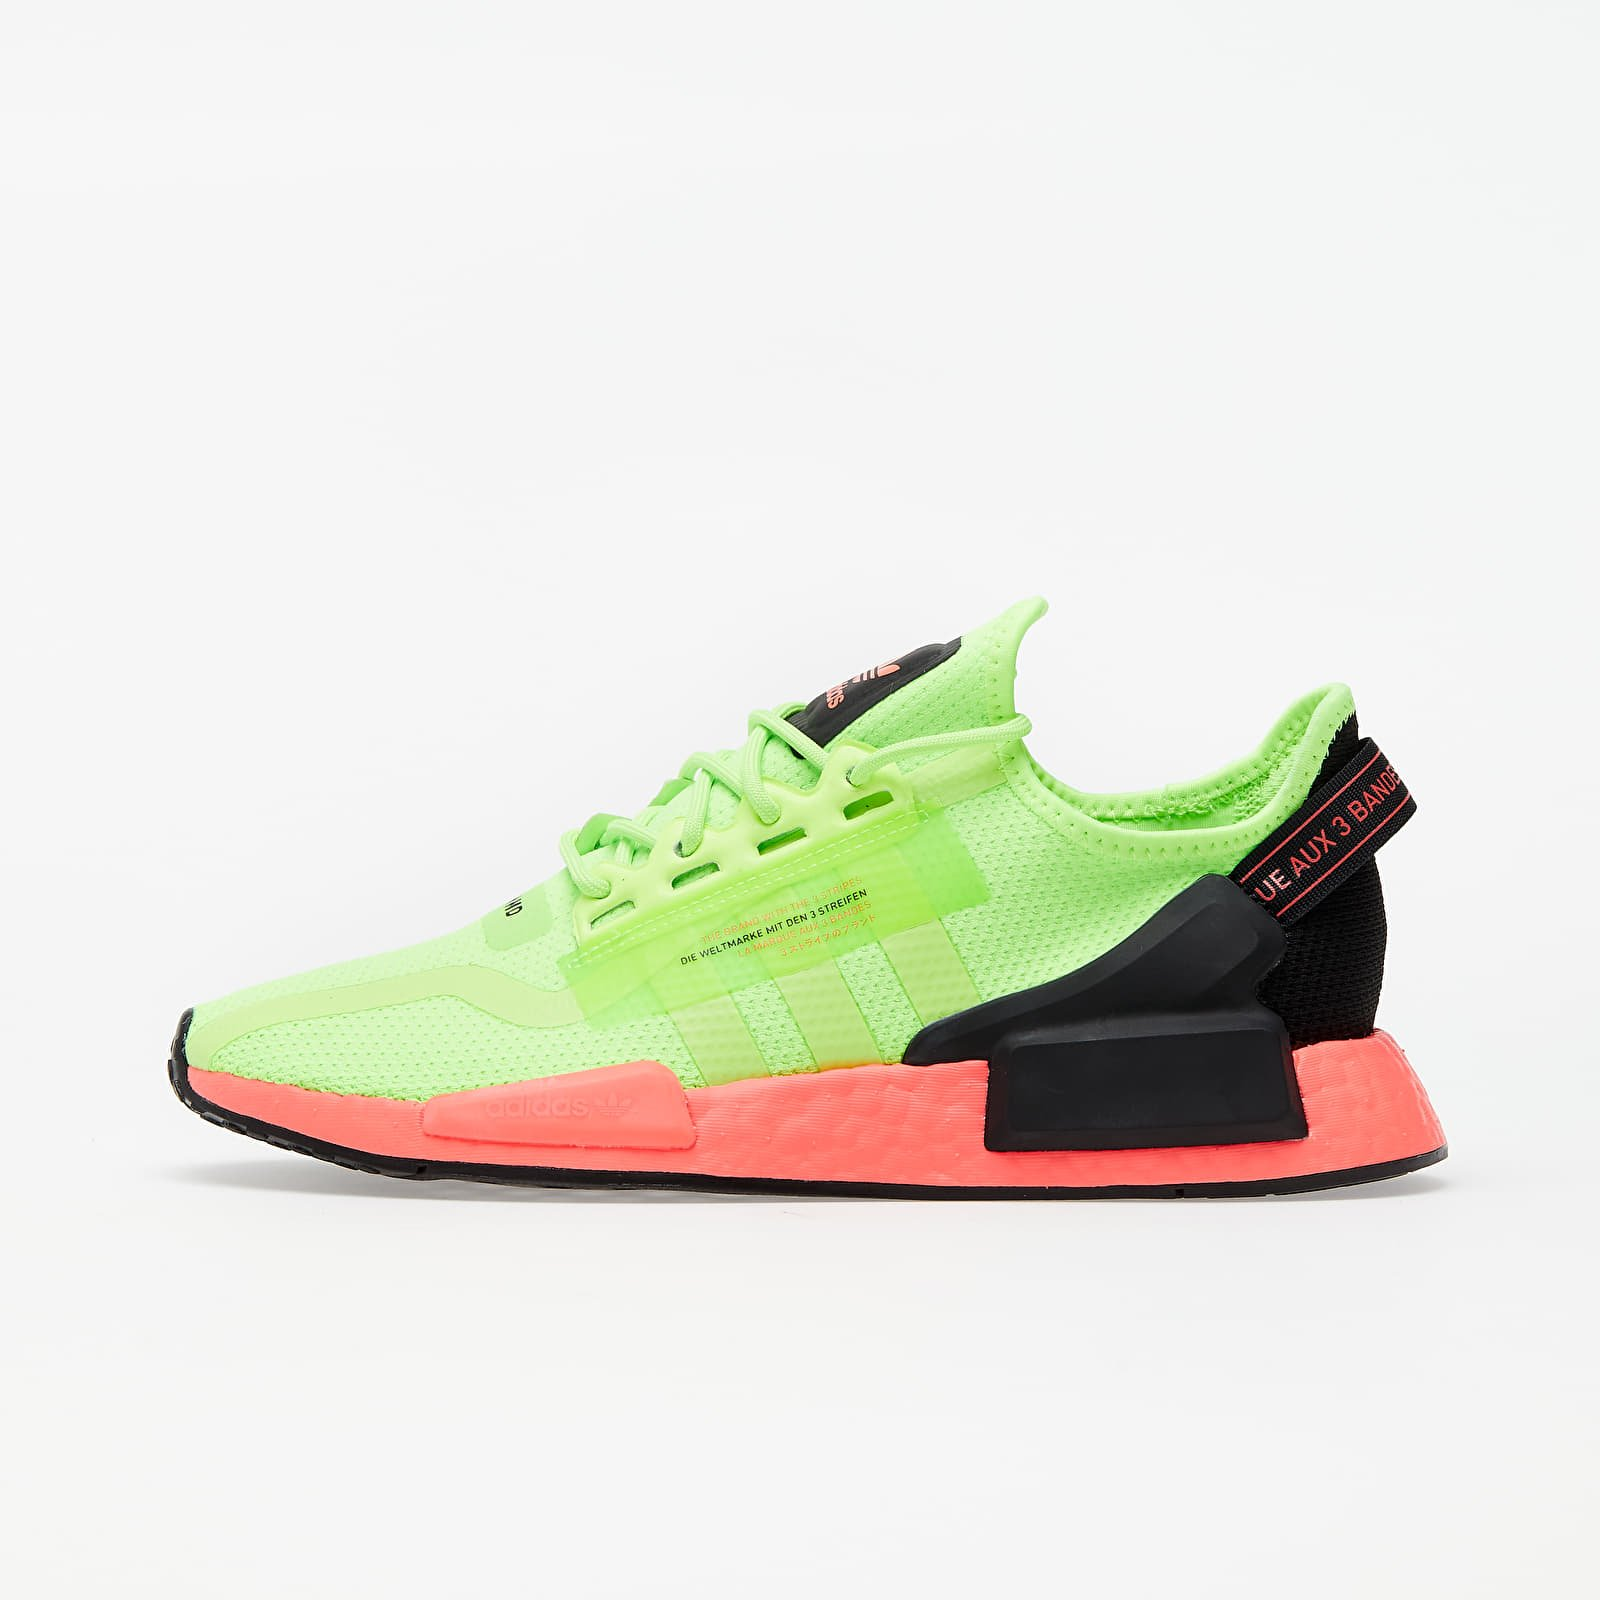 Pánské tenisky a boty adidas NMD_R1.V2 Signature Green/ Signature Green/ Signature Pink